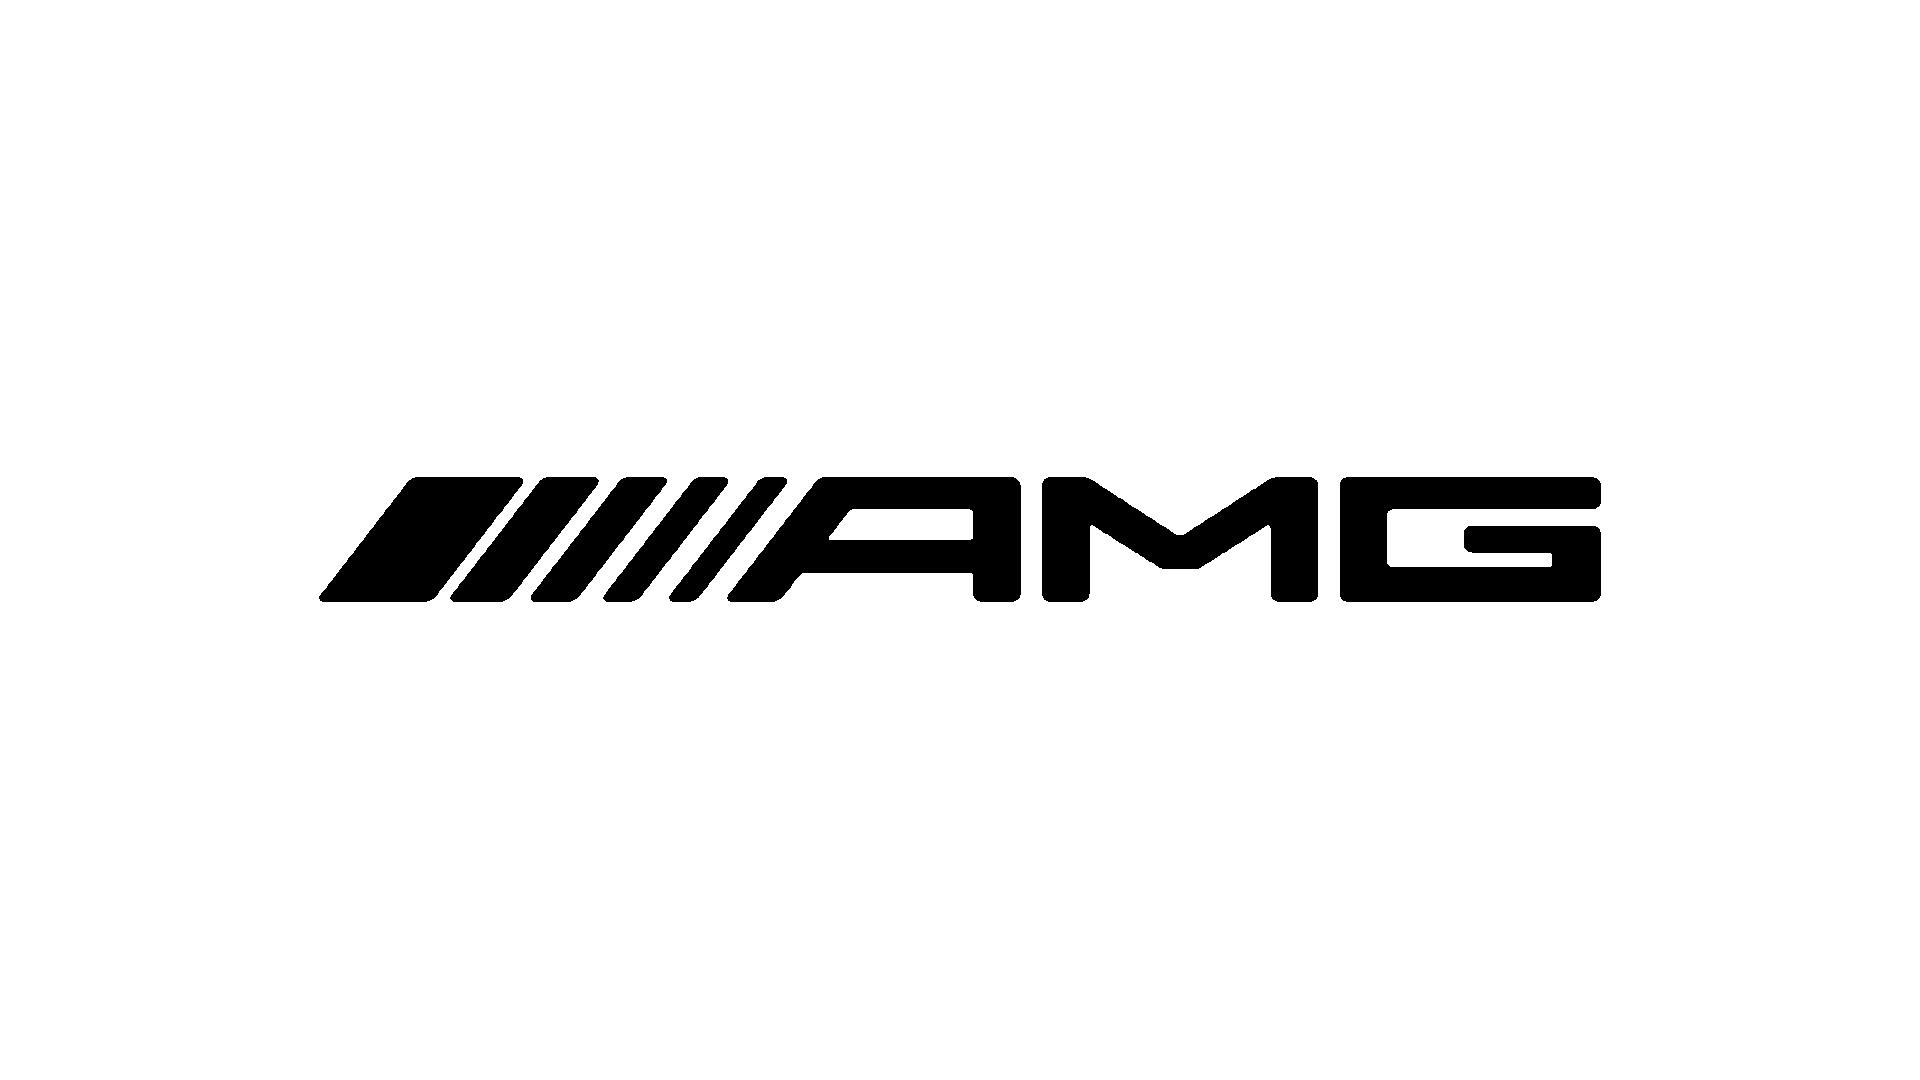 AMG-logo-black-1920x1080